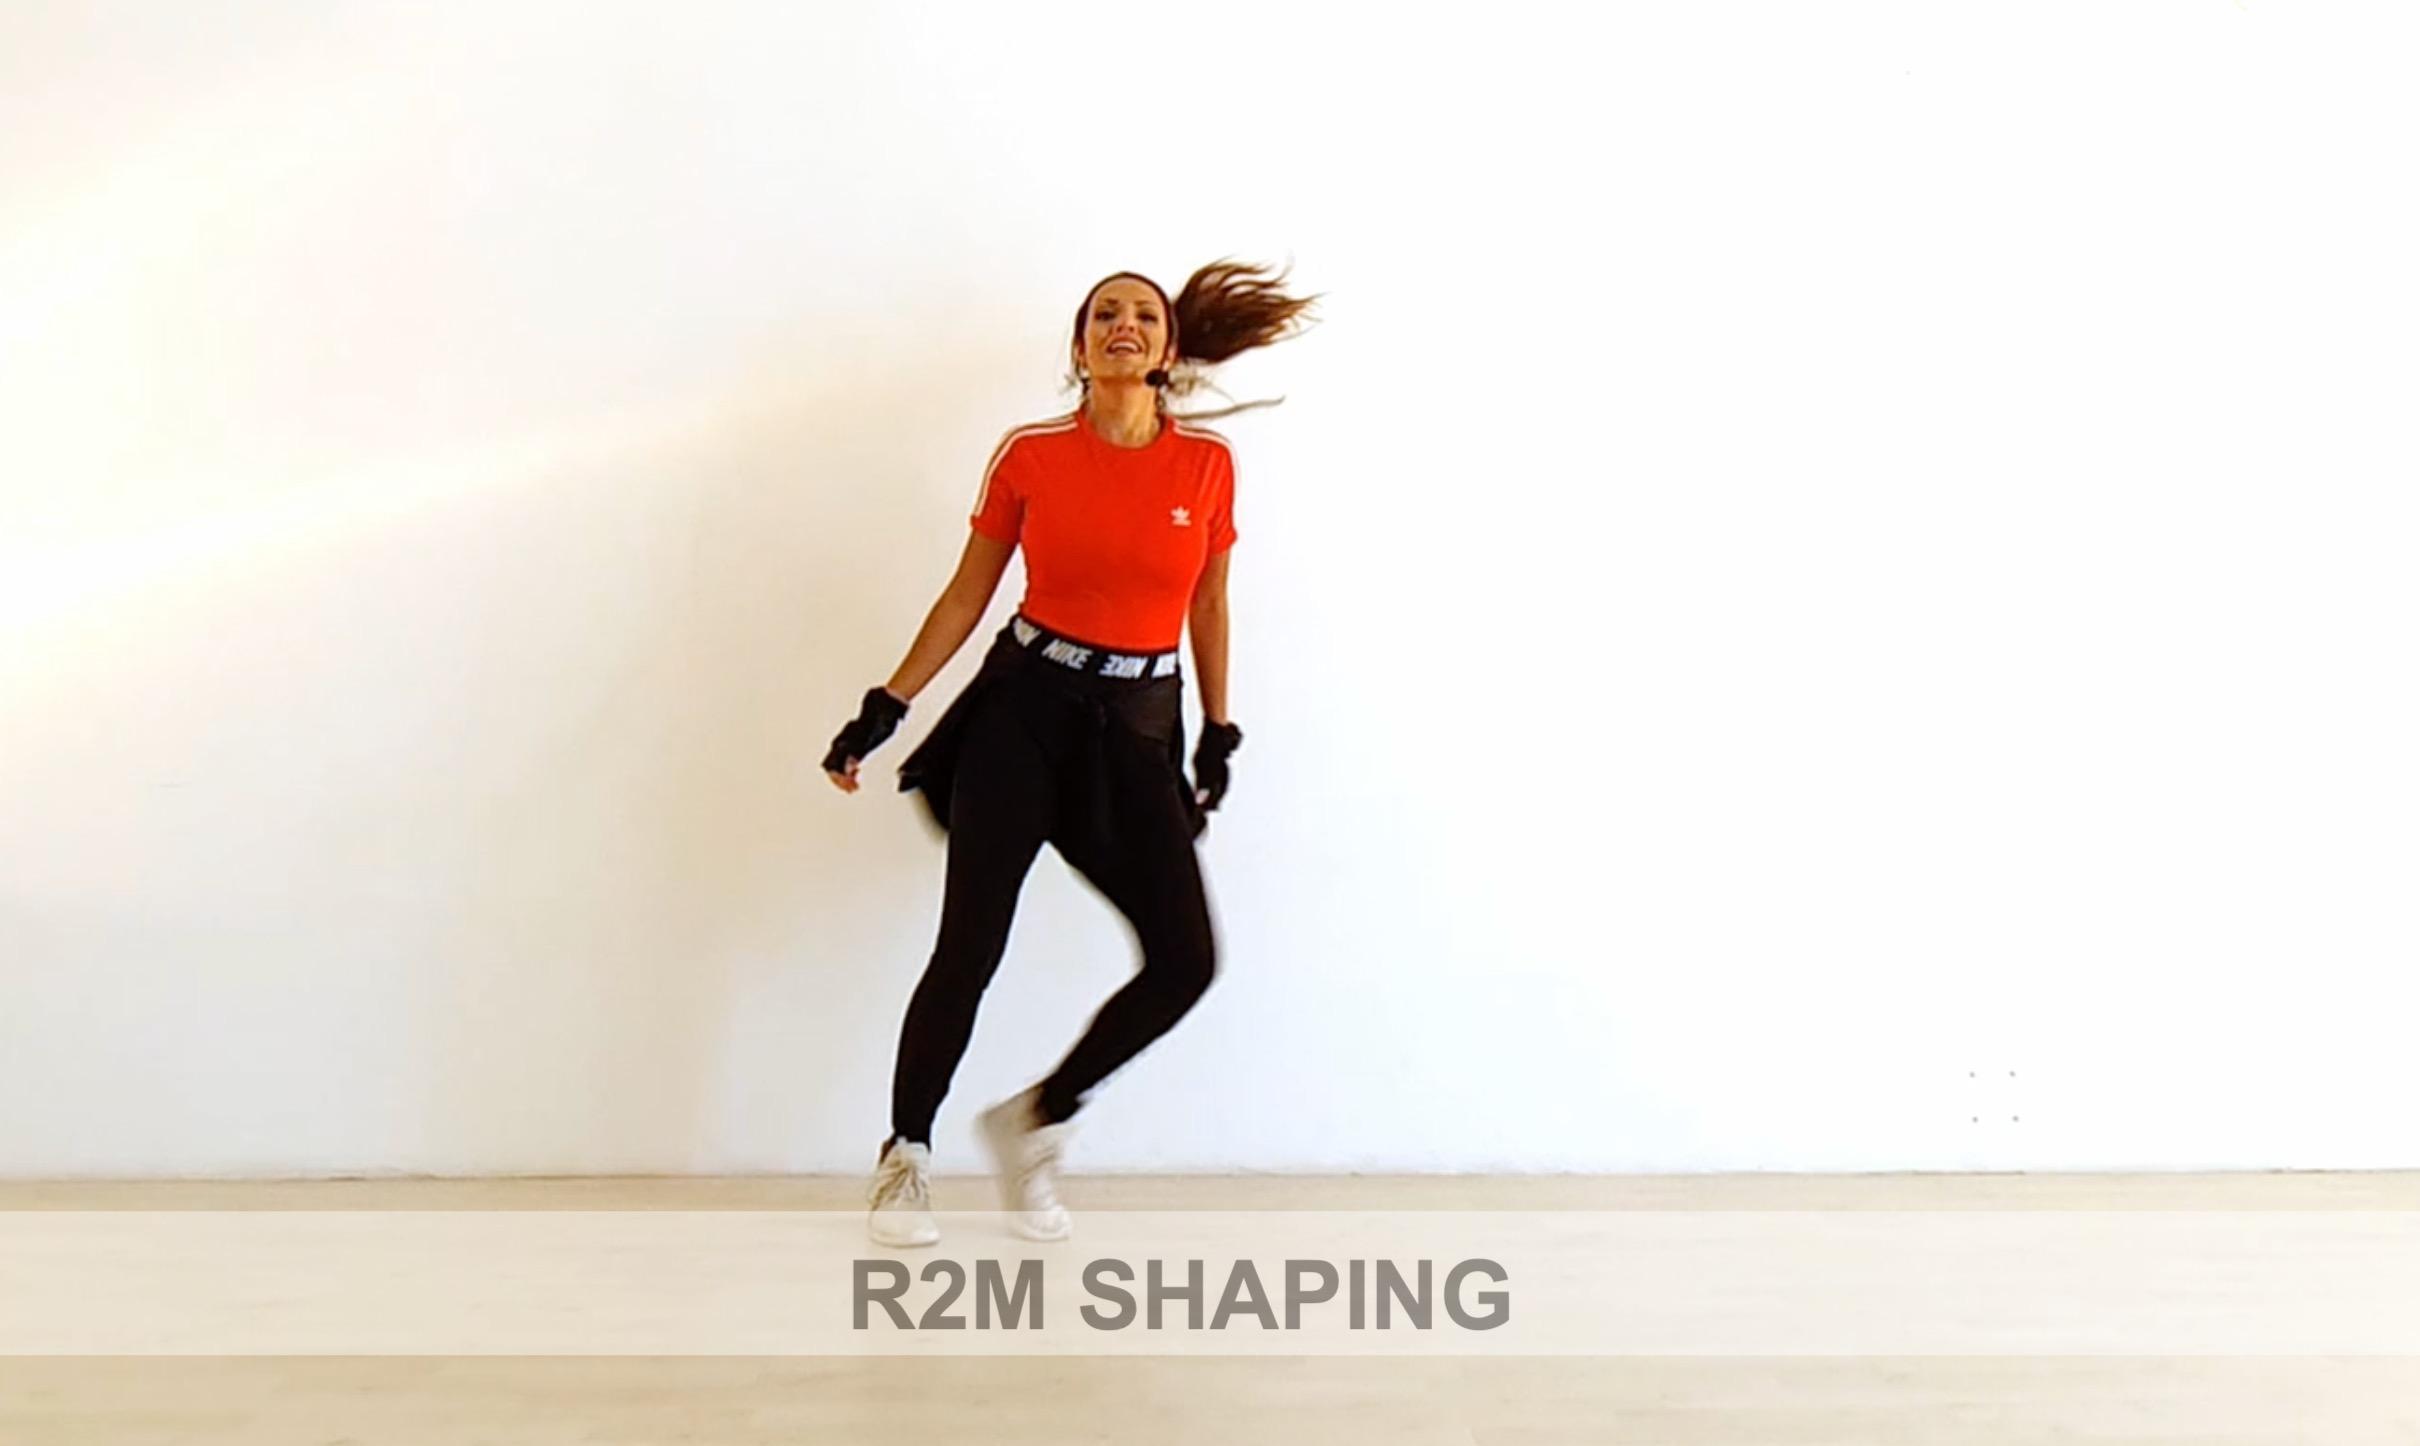 R2M SHAPING